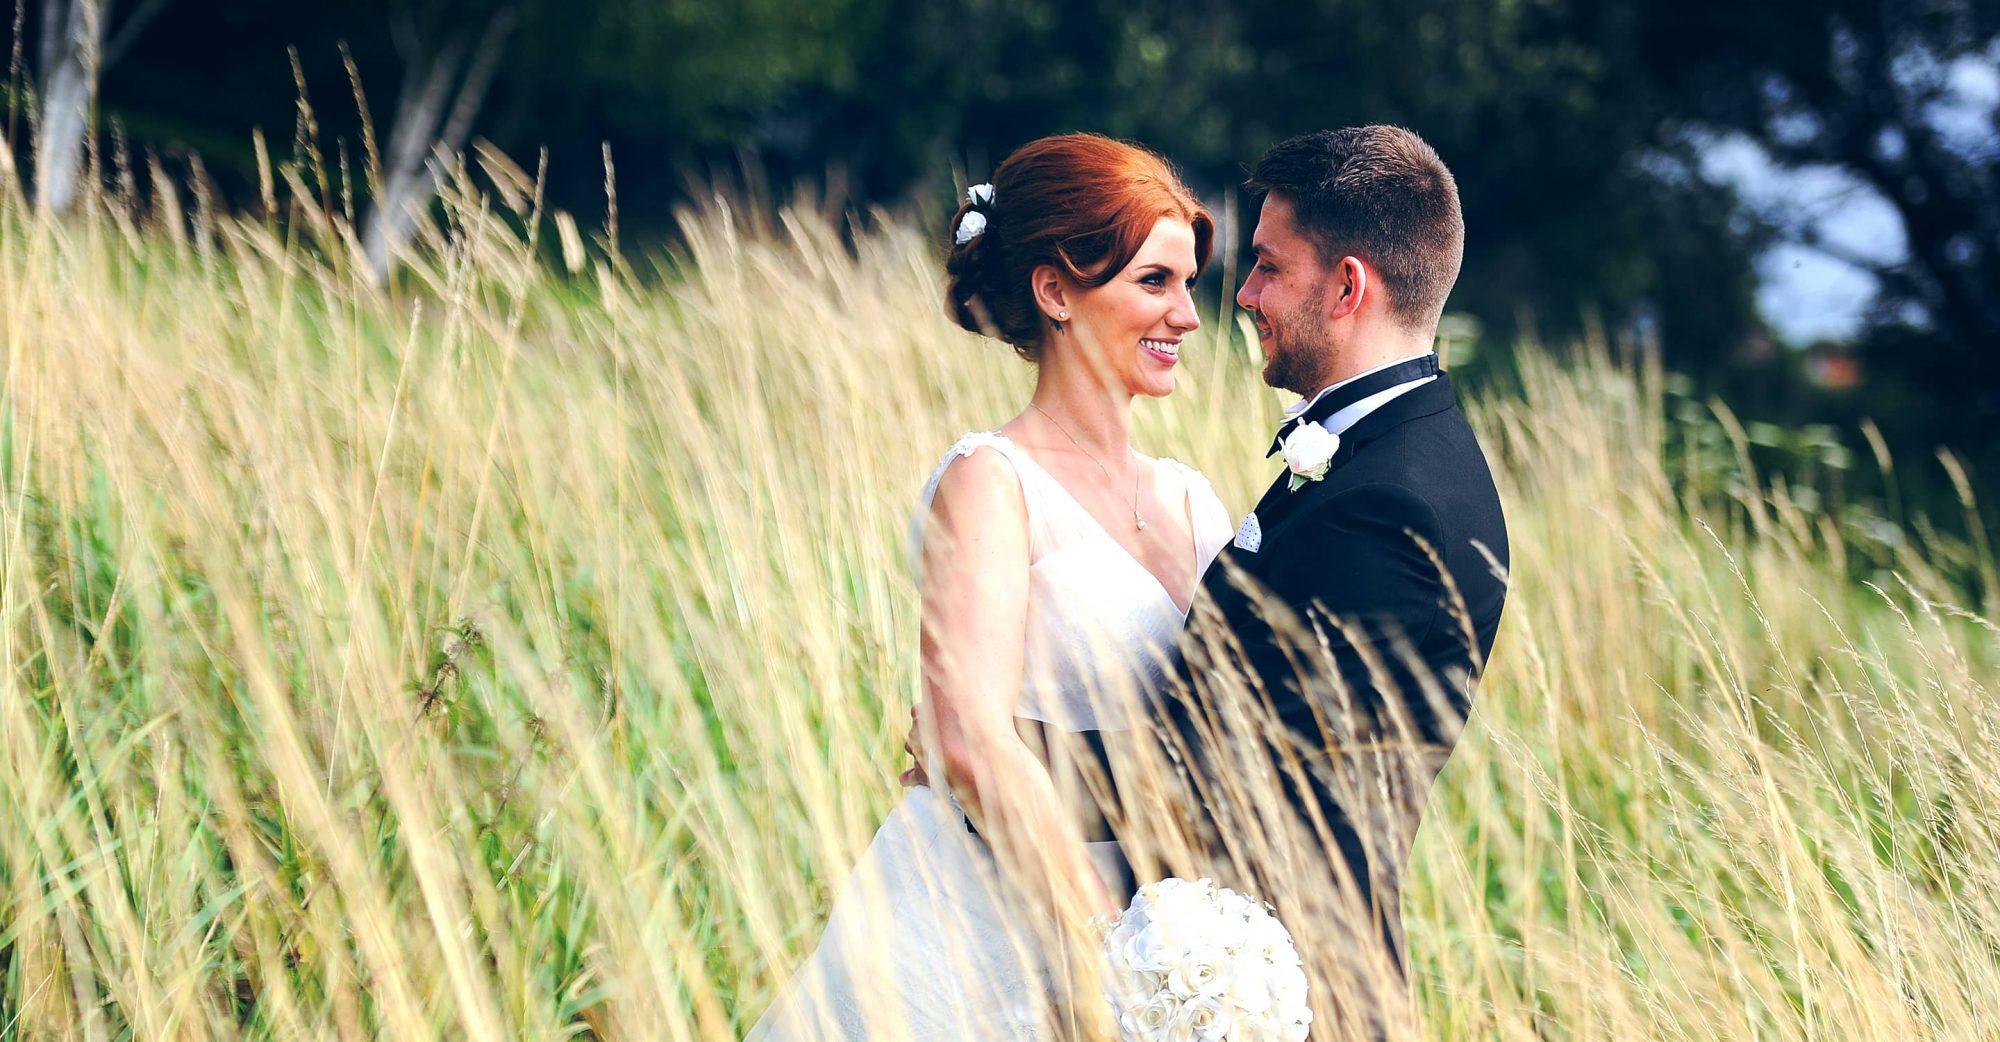 Wedding Pictures - Gregg Brown, Essex